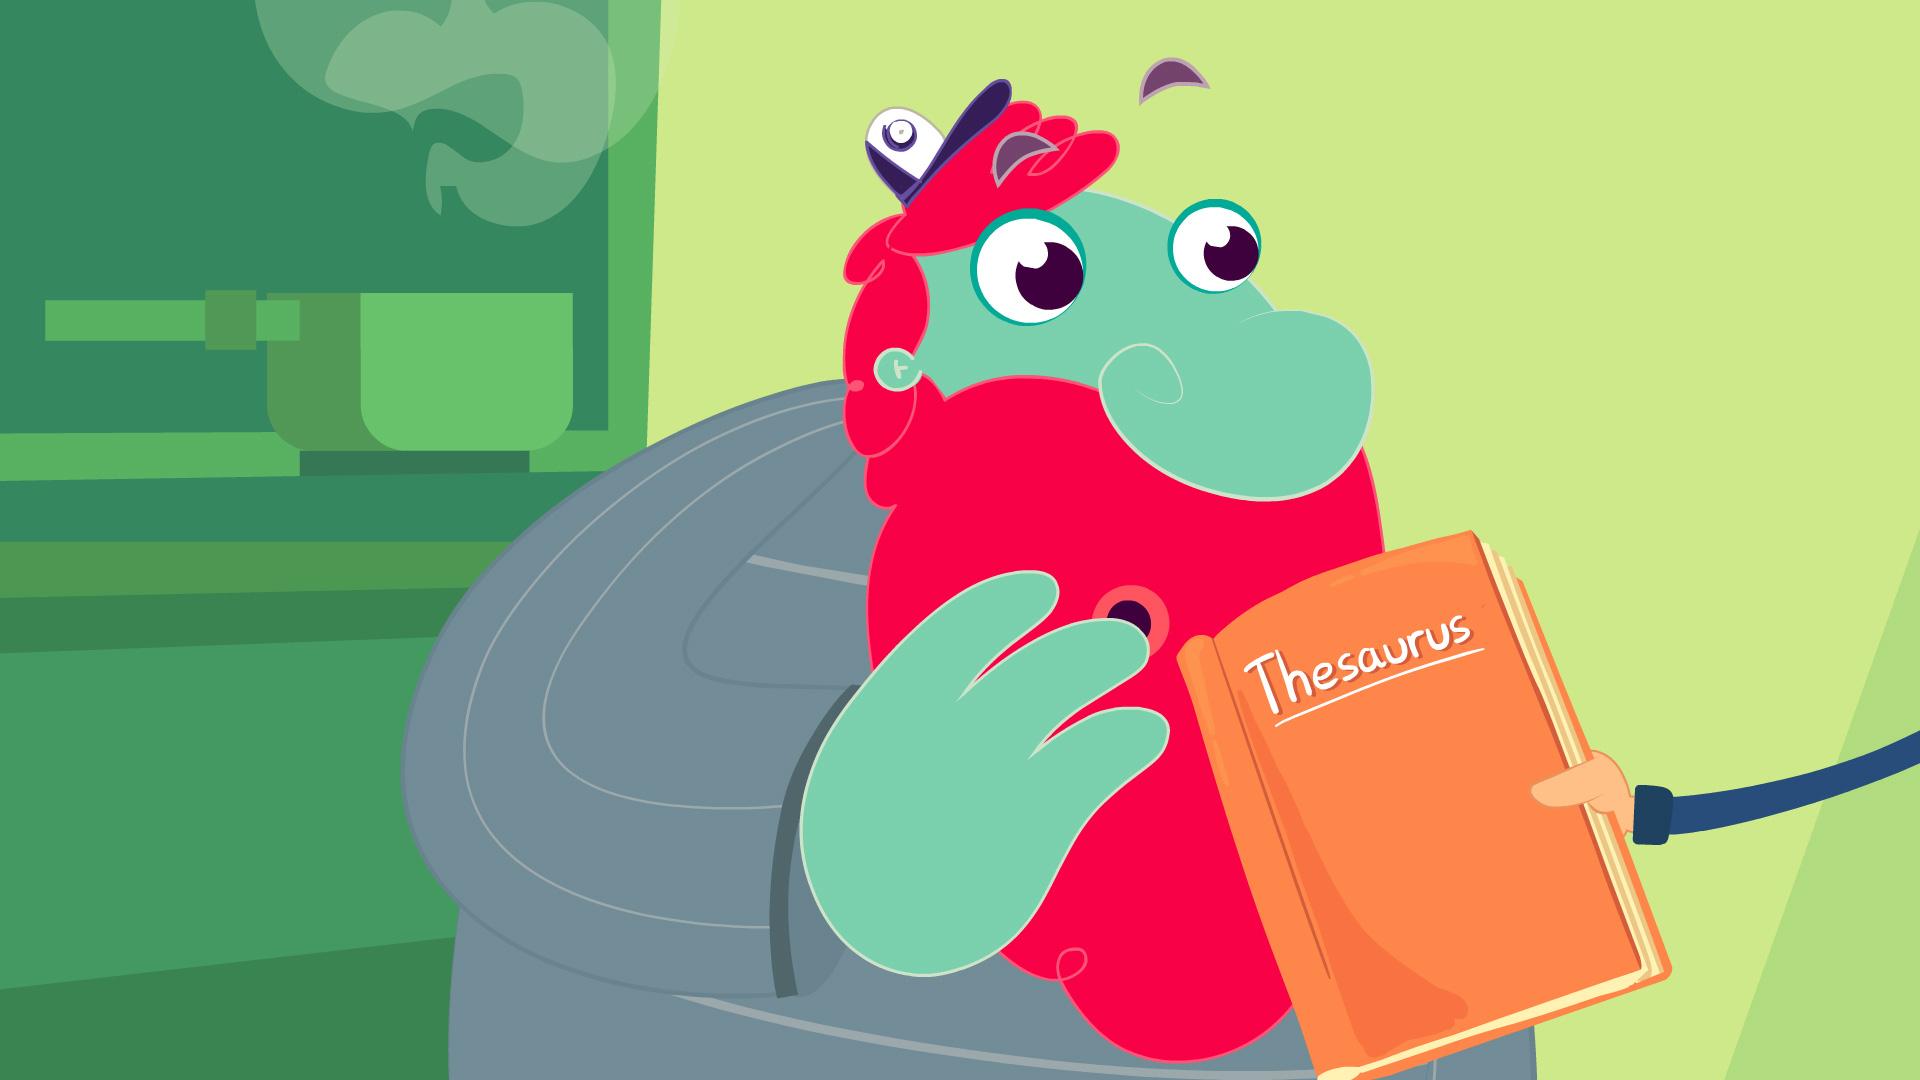 Using a Thesaurus